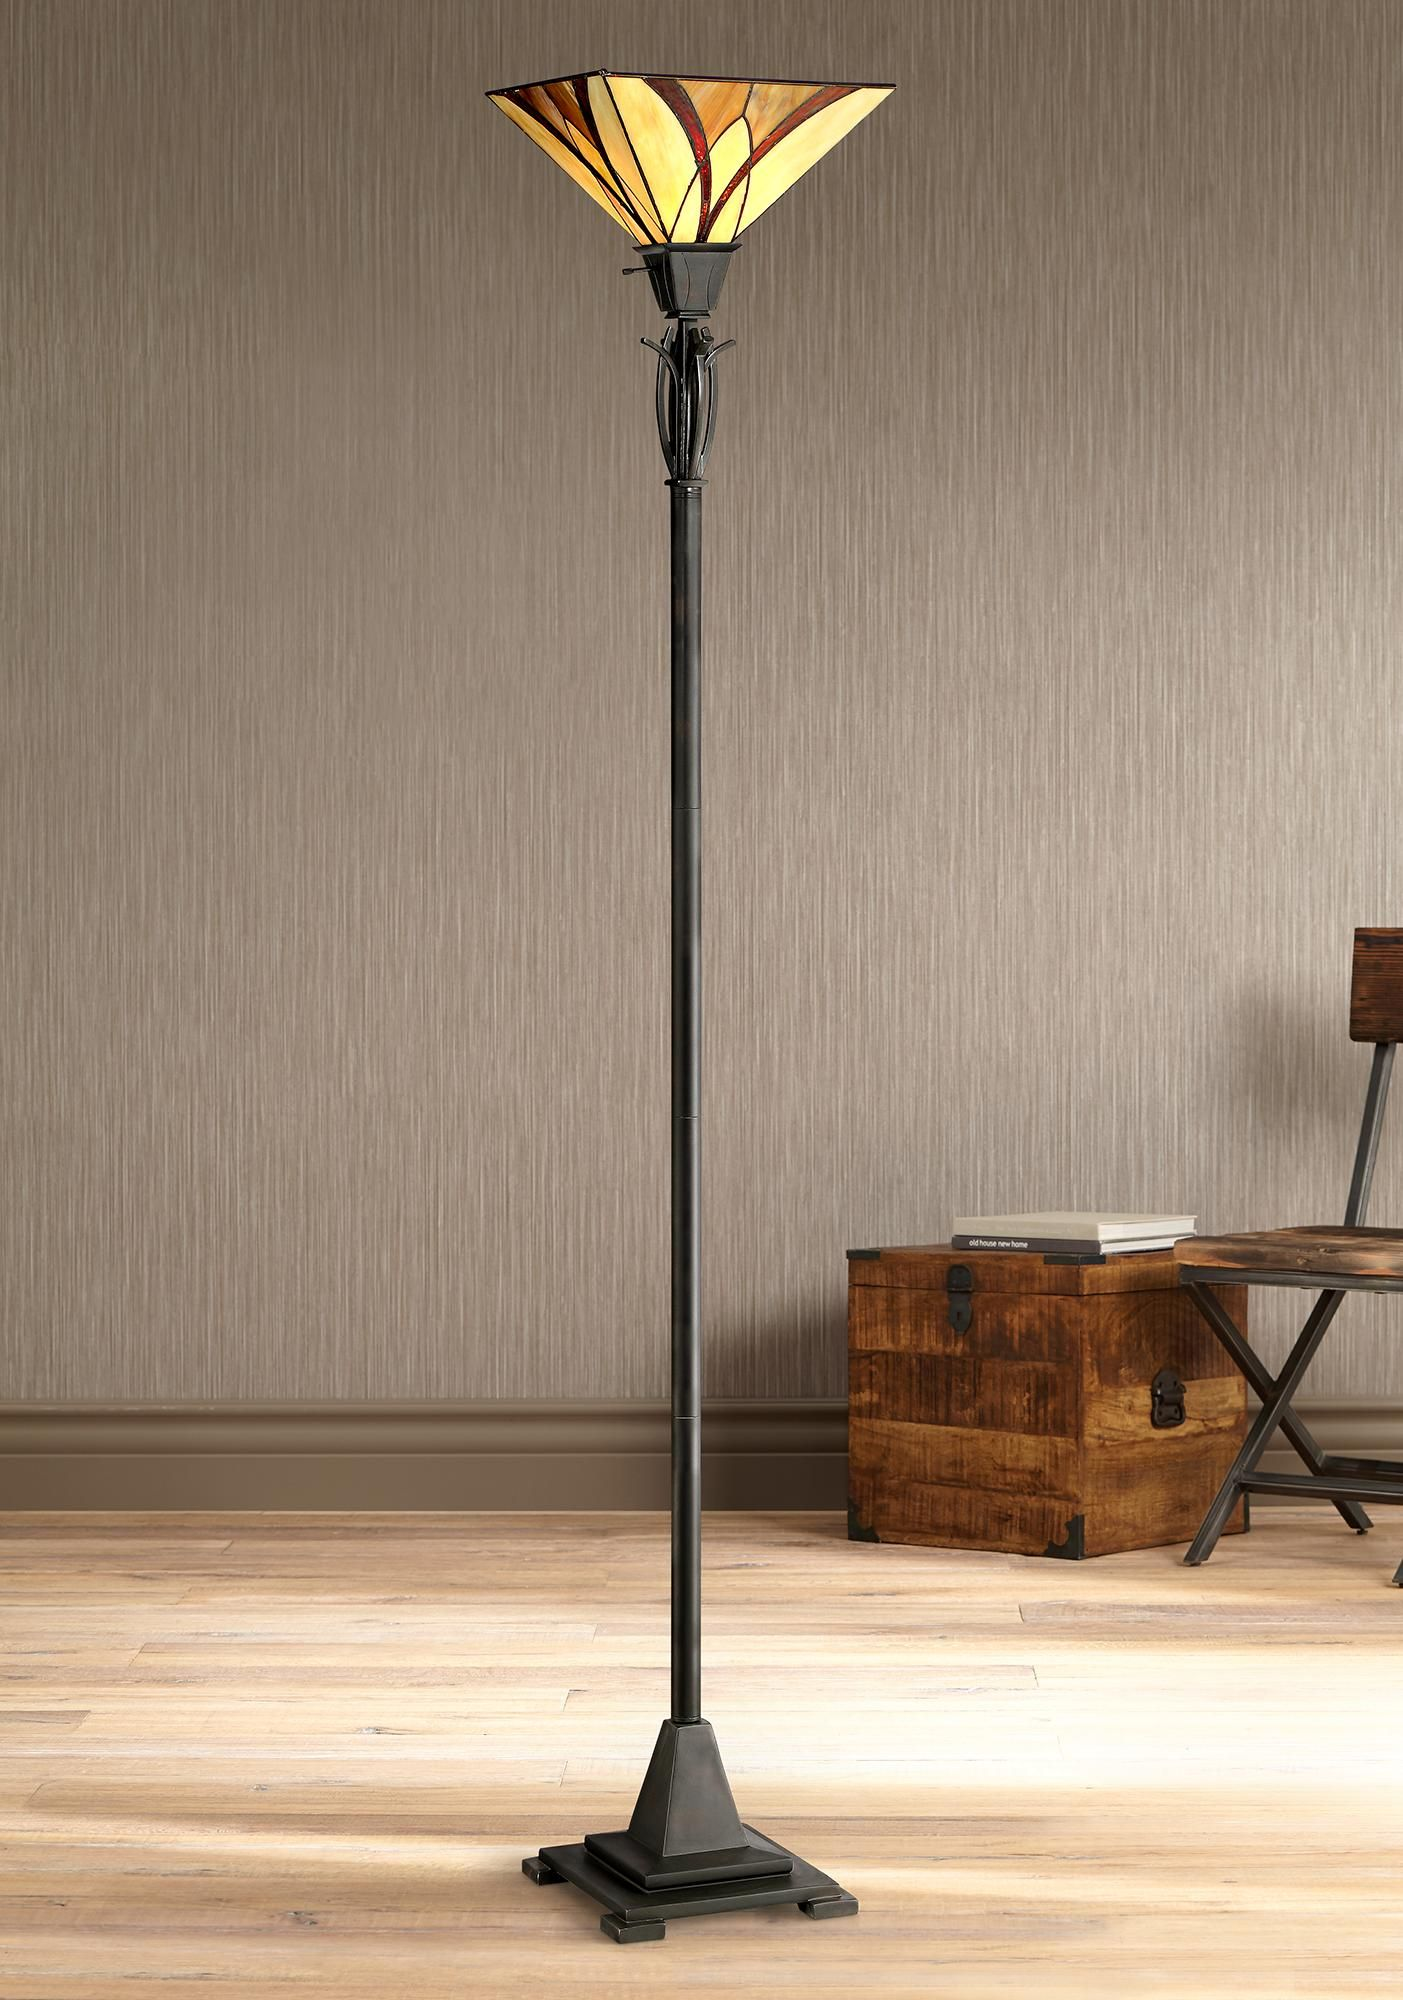 Floor Lamps Quoizel Asheville Valiant Bronze Torchiere Floor Lamp In 2020 Torchiere Floor Lamp Lamp Tiffany Floor Lamp